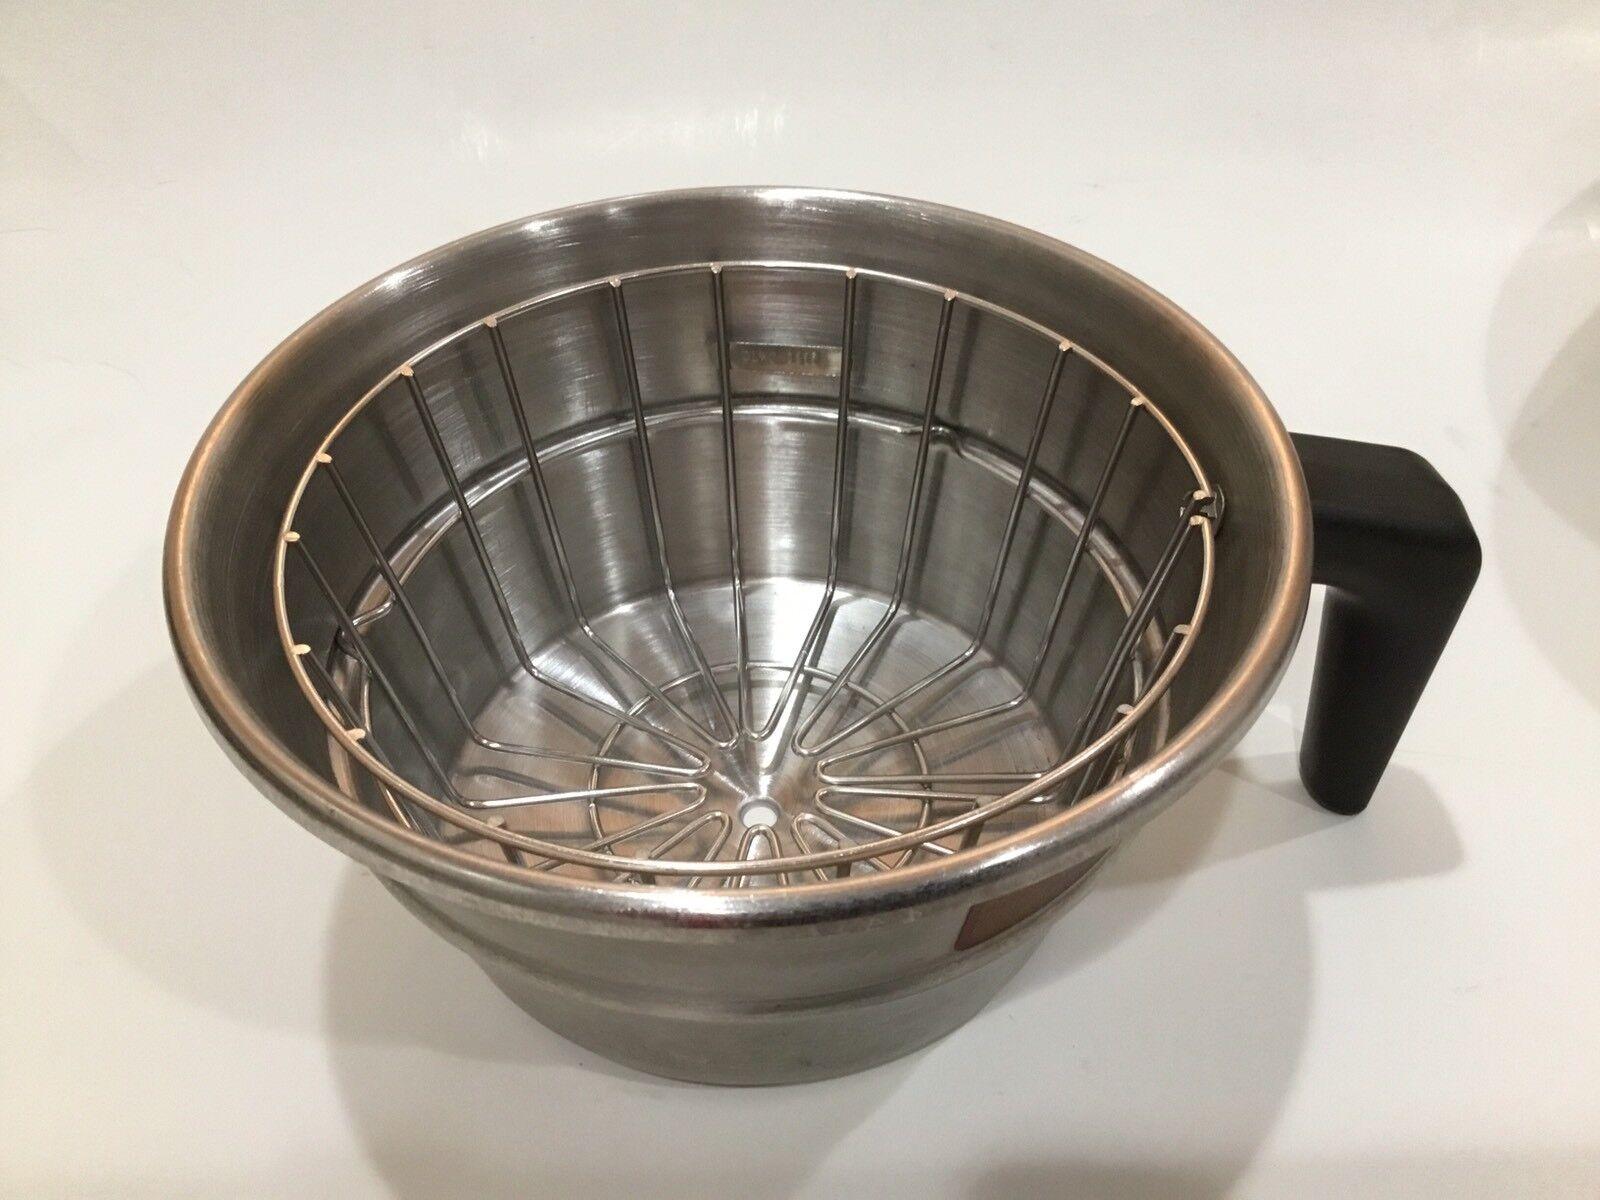 Wilbur Curtis 37256 Cone Brew Gourmet Kit